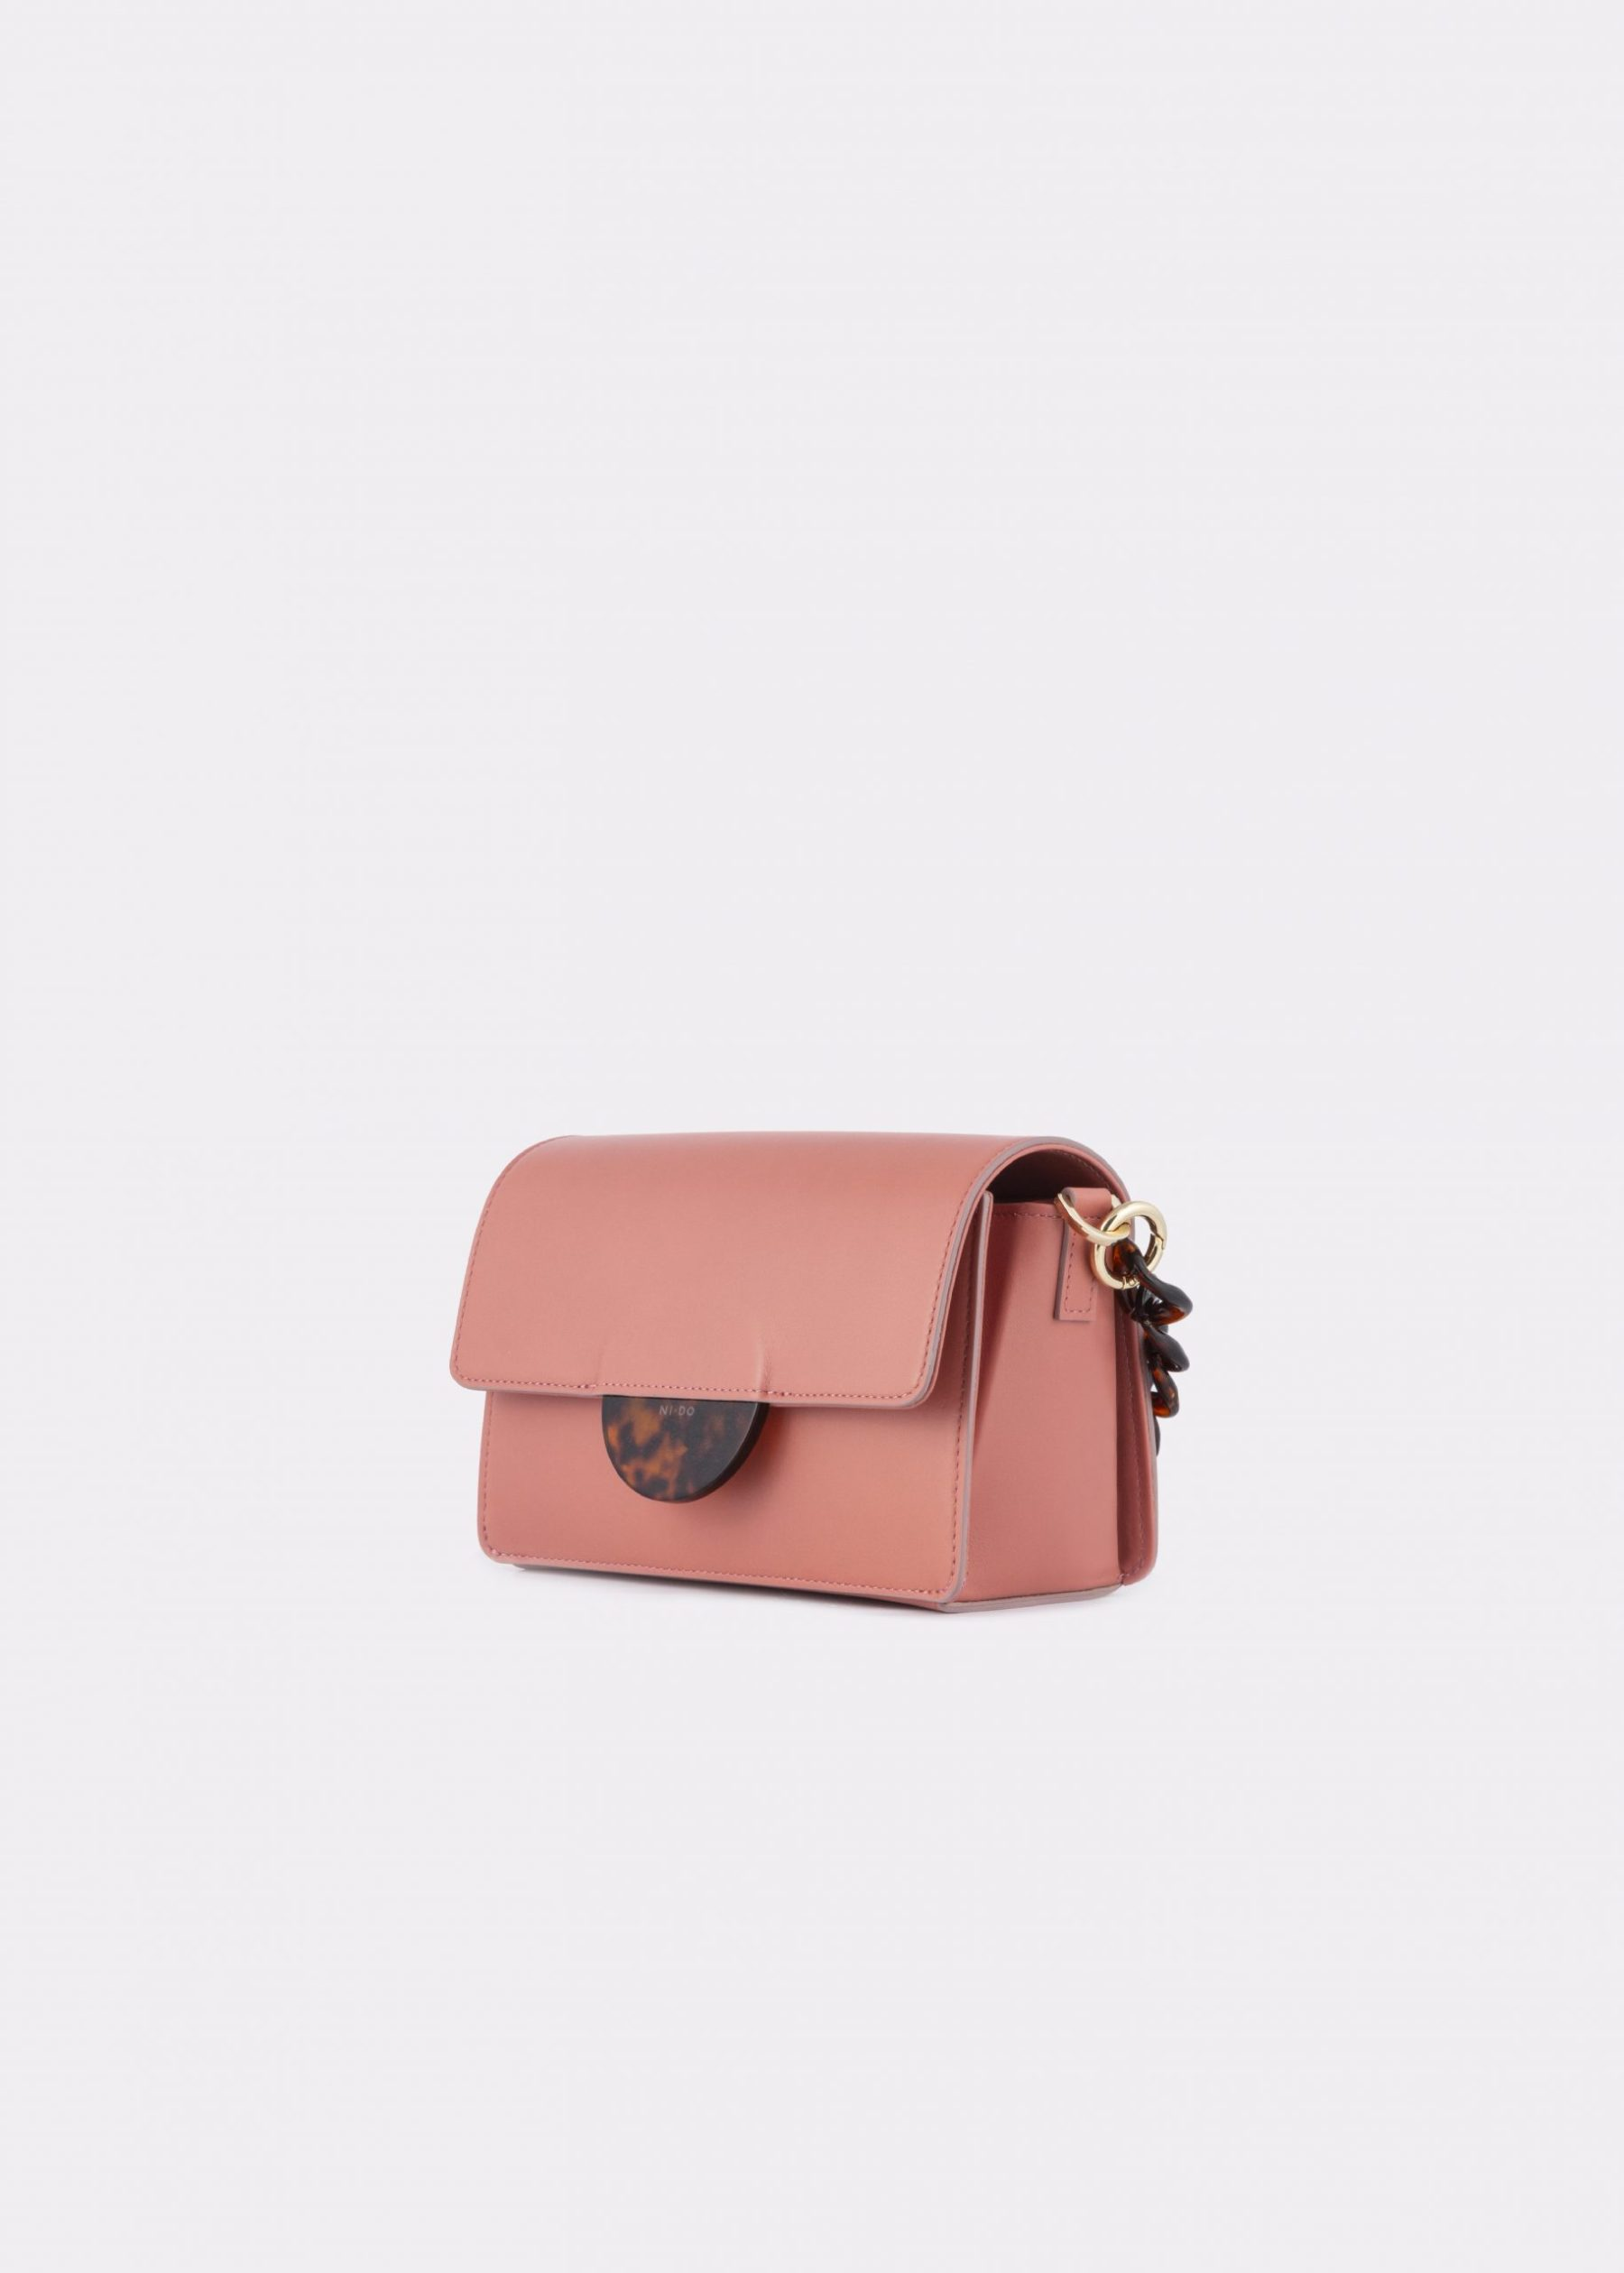 NIDO Cuore Mini bag Blush side view